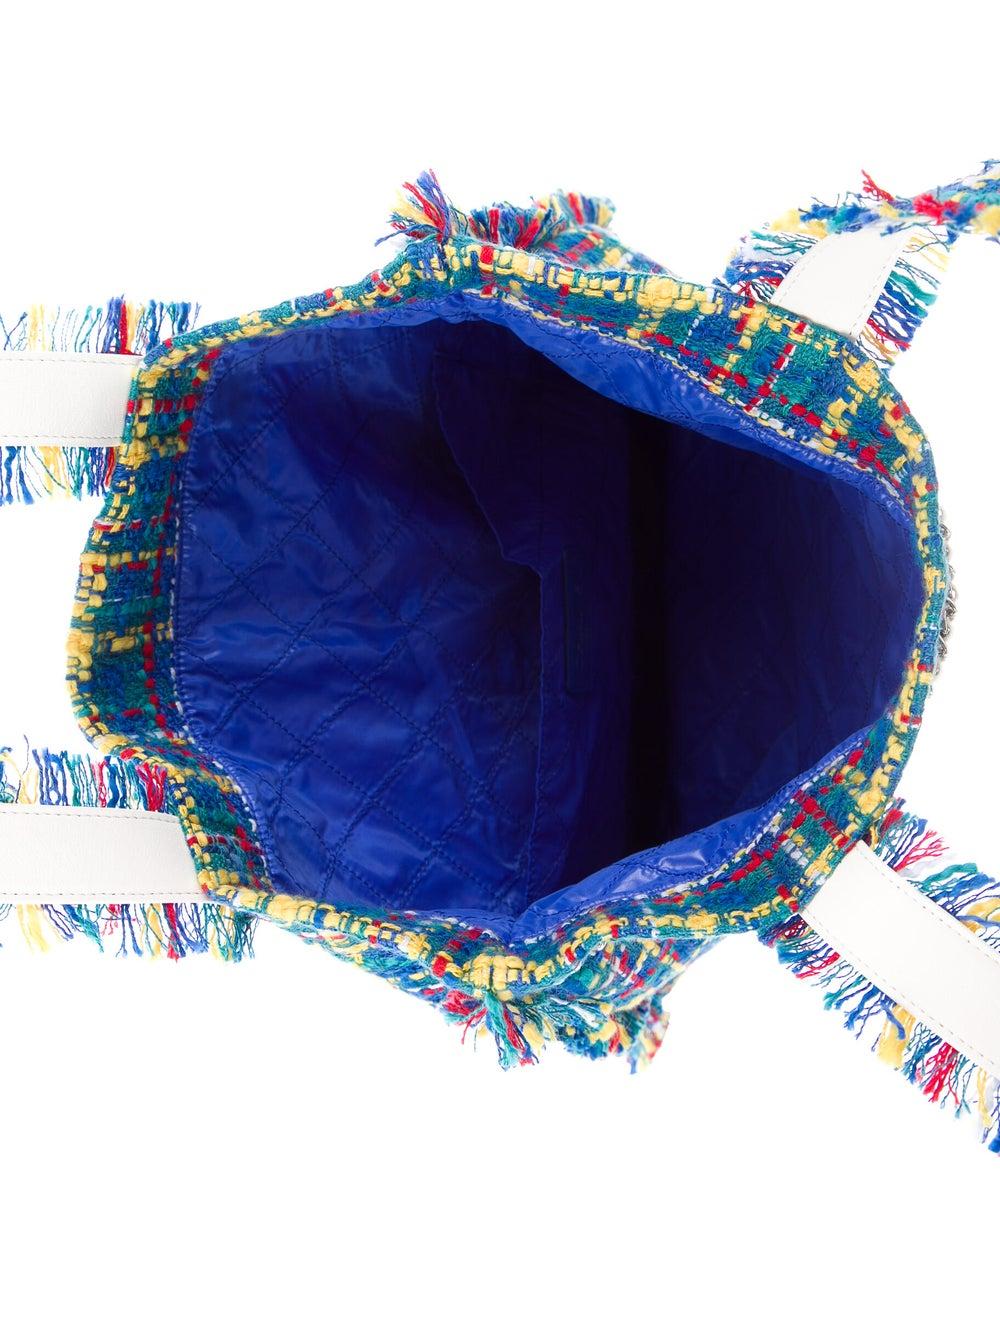 Chanel Large Tweed Shopping Bag Blue - image 5